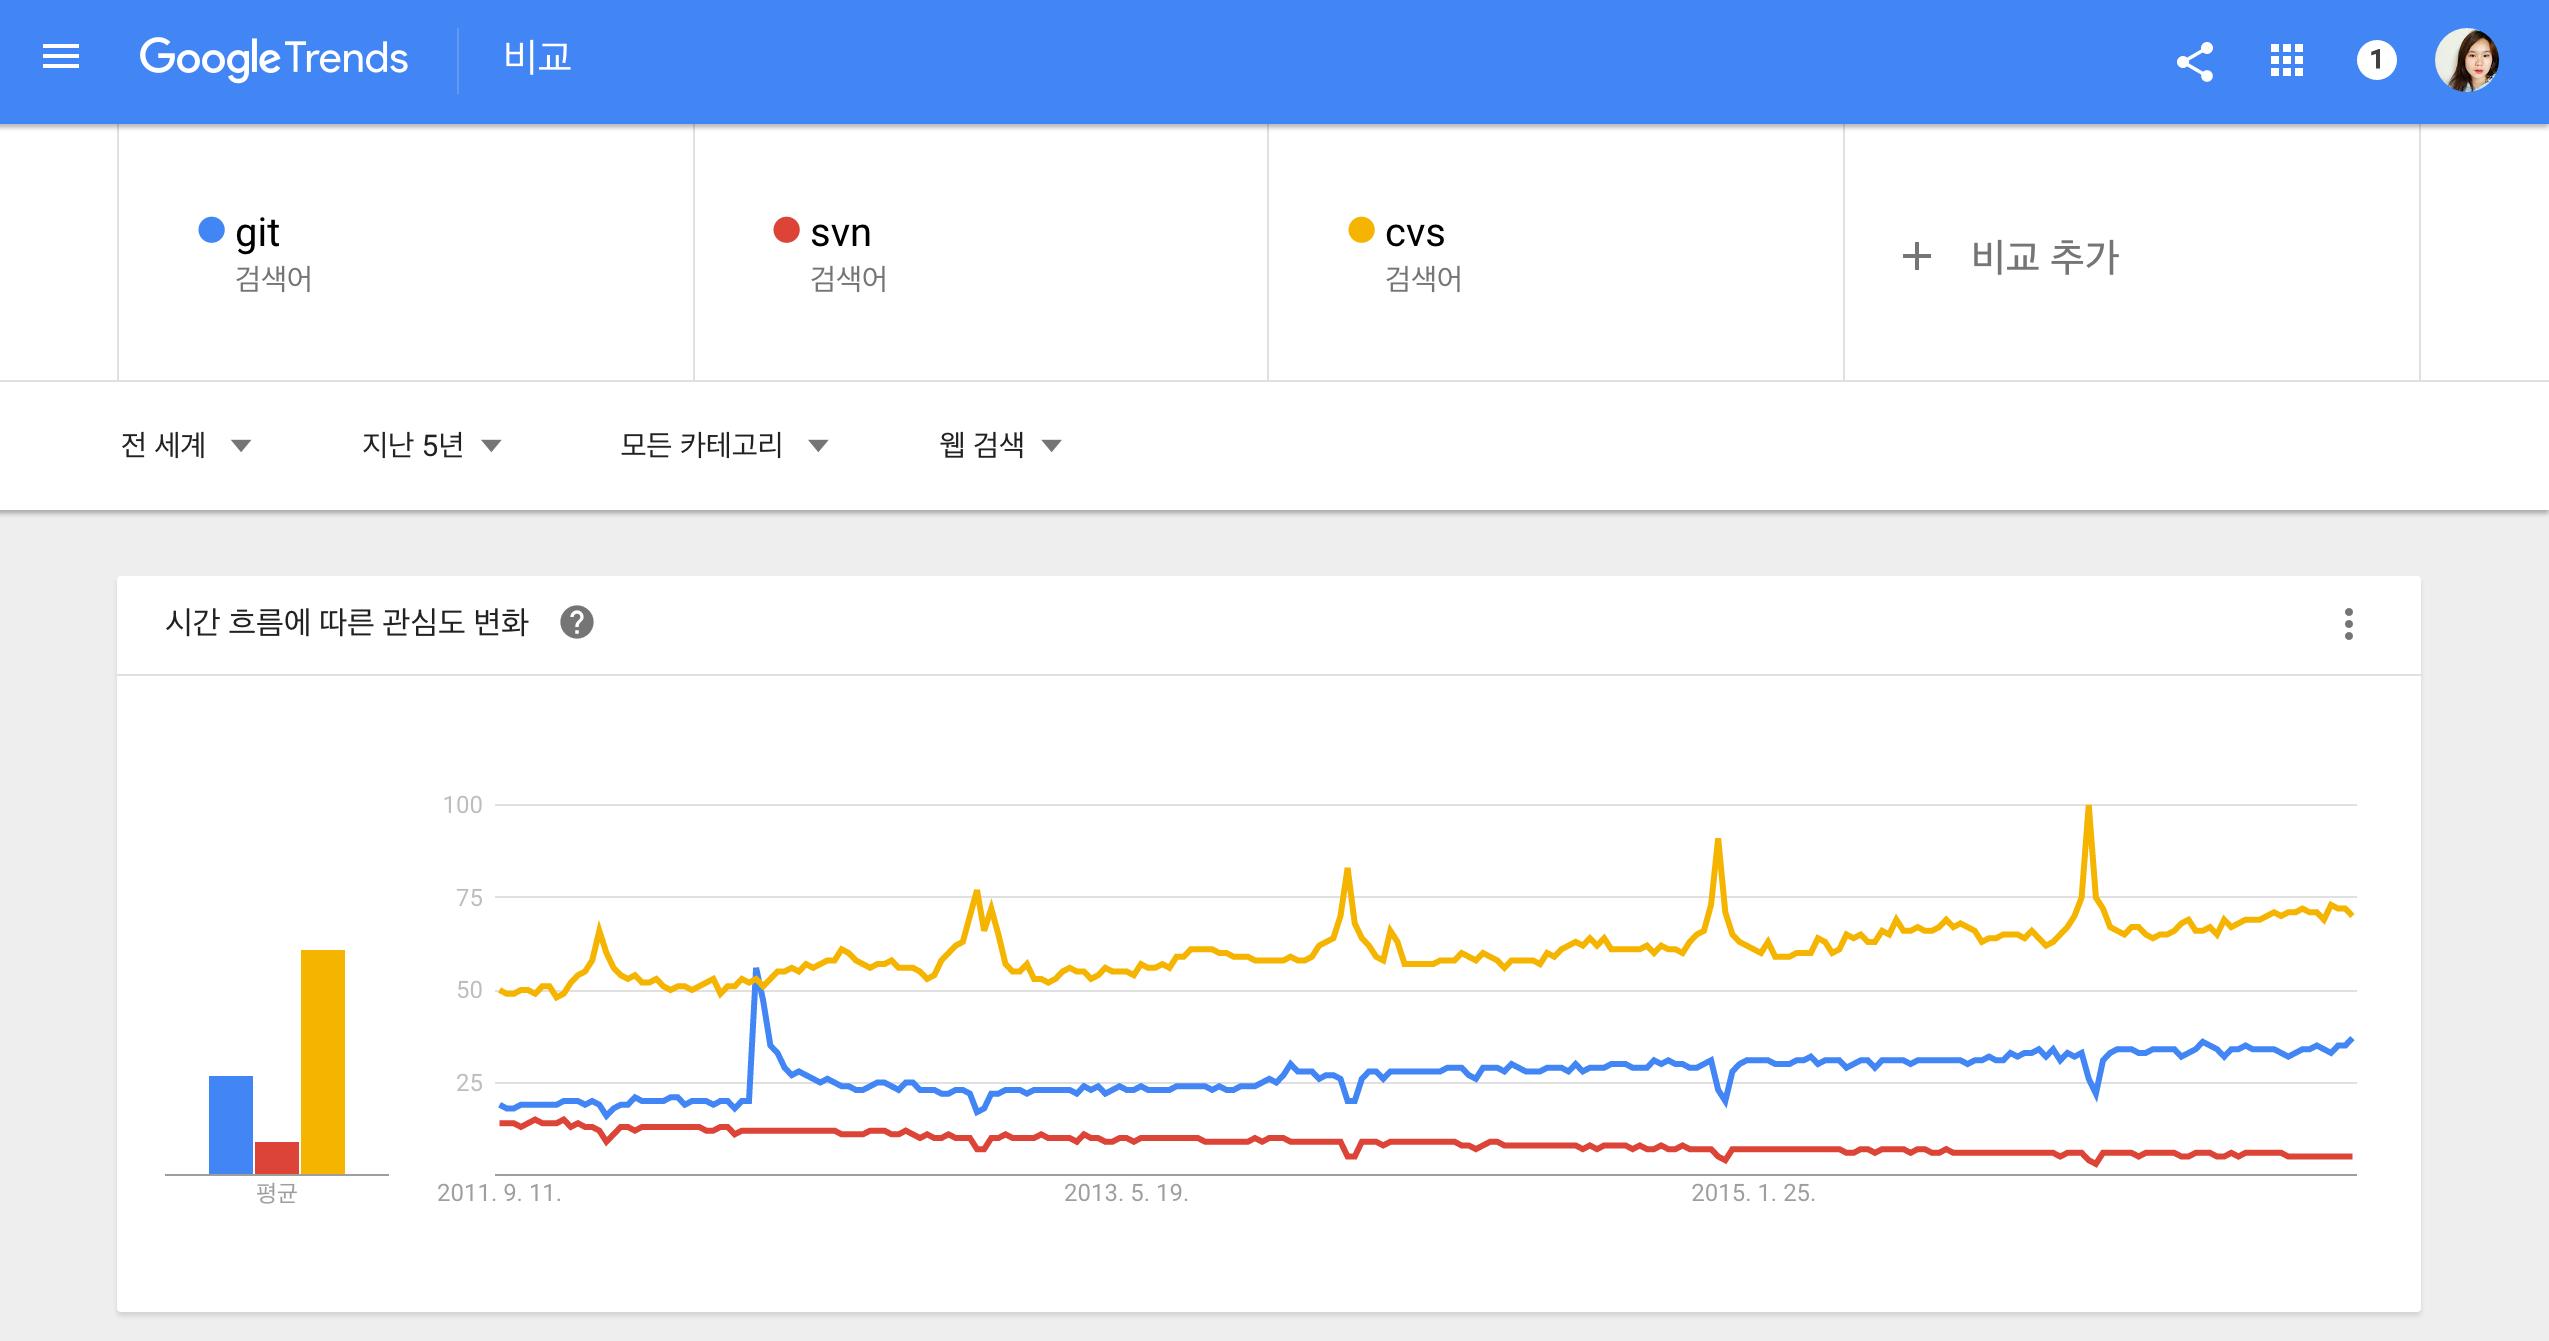 Google Trend로 git, svn, cvs 비교